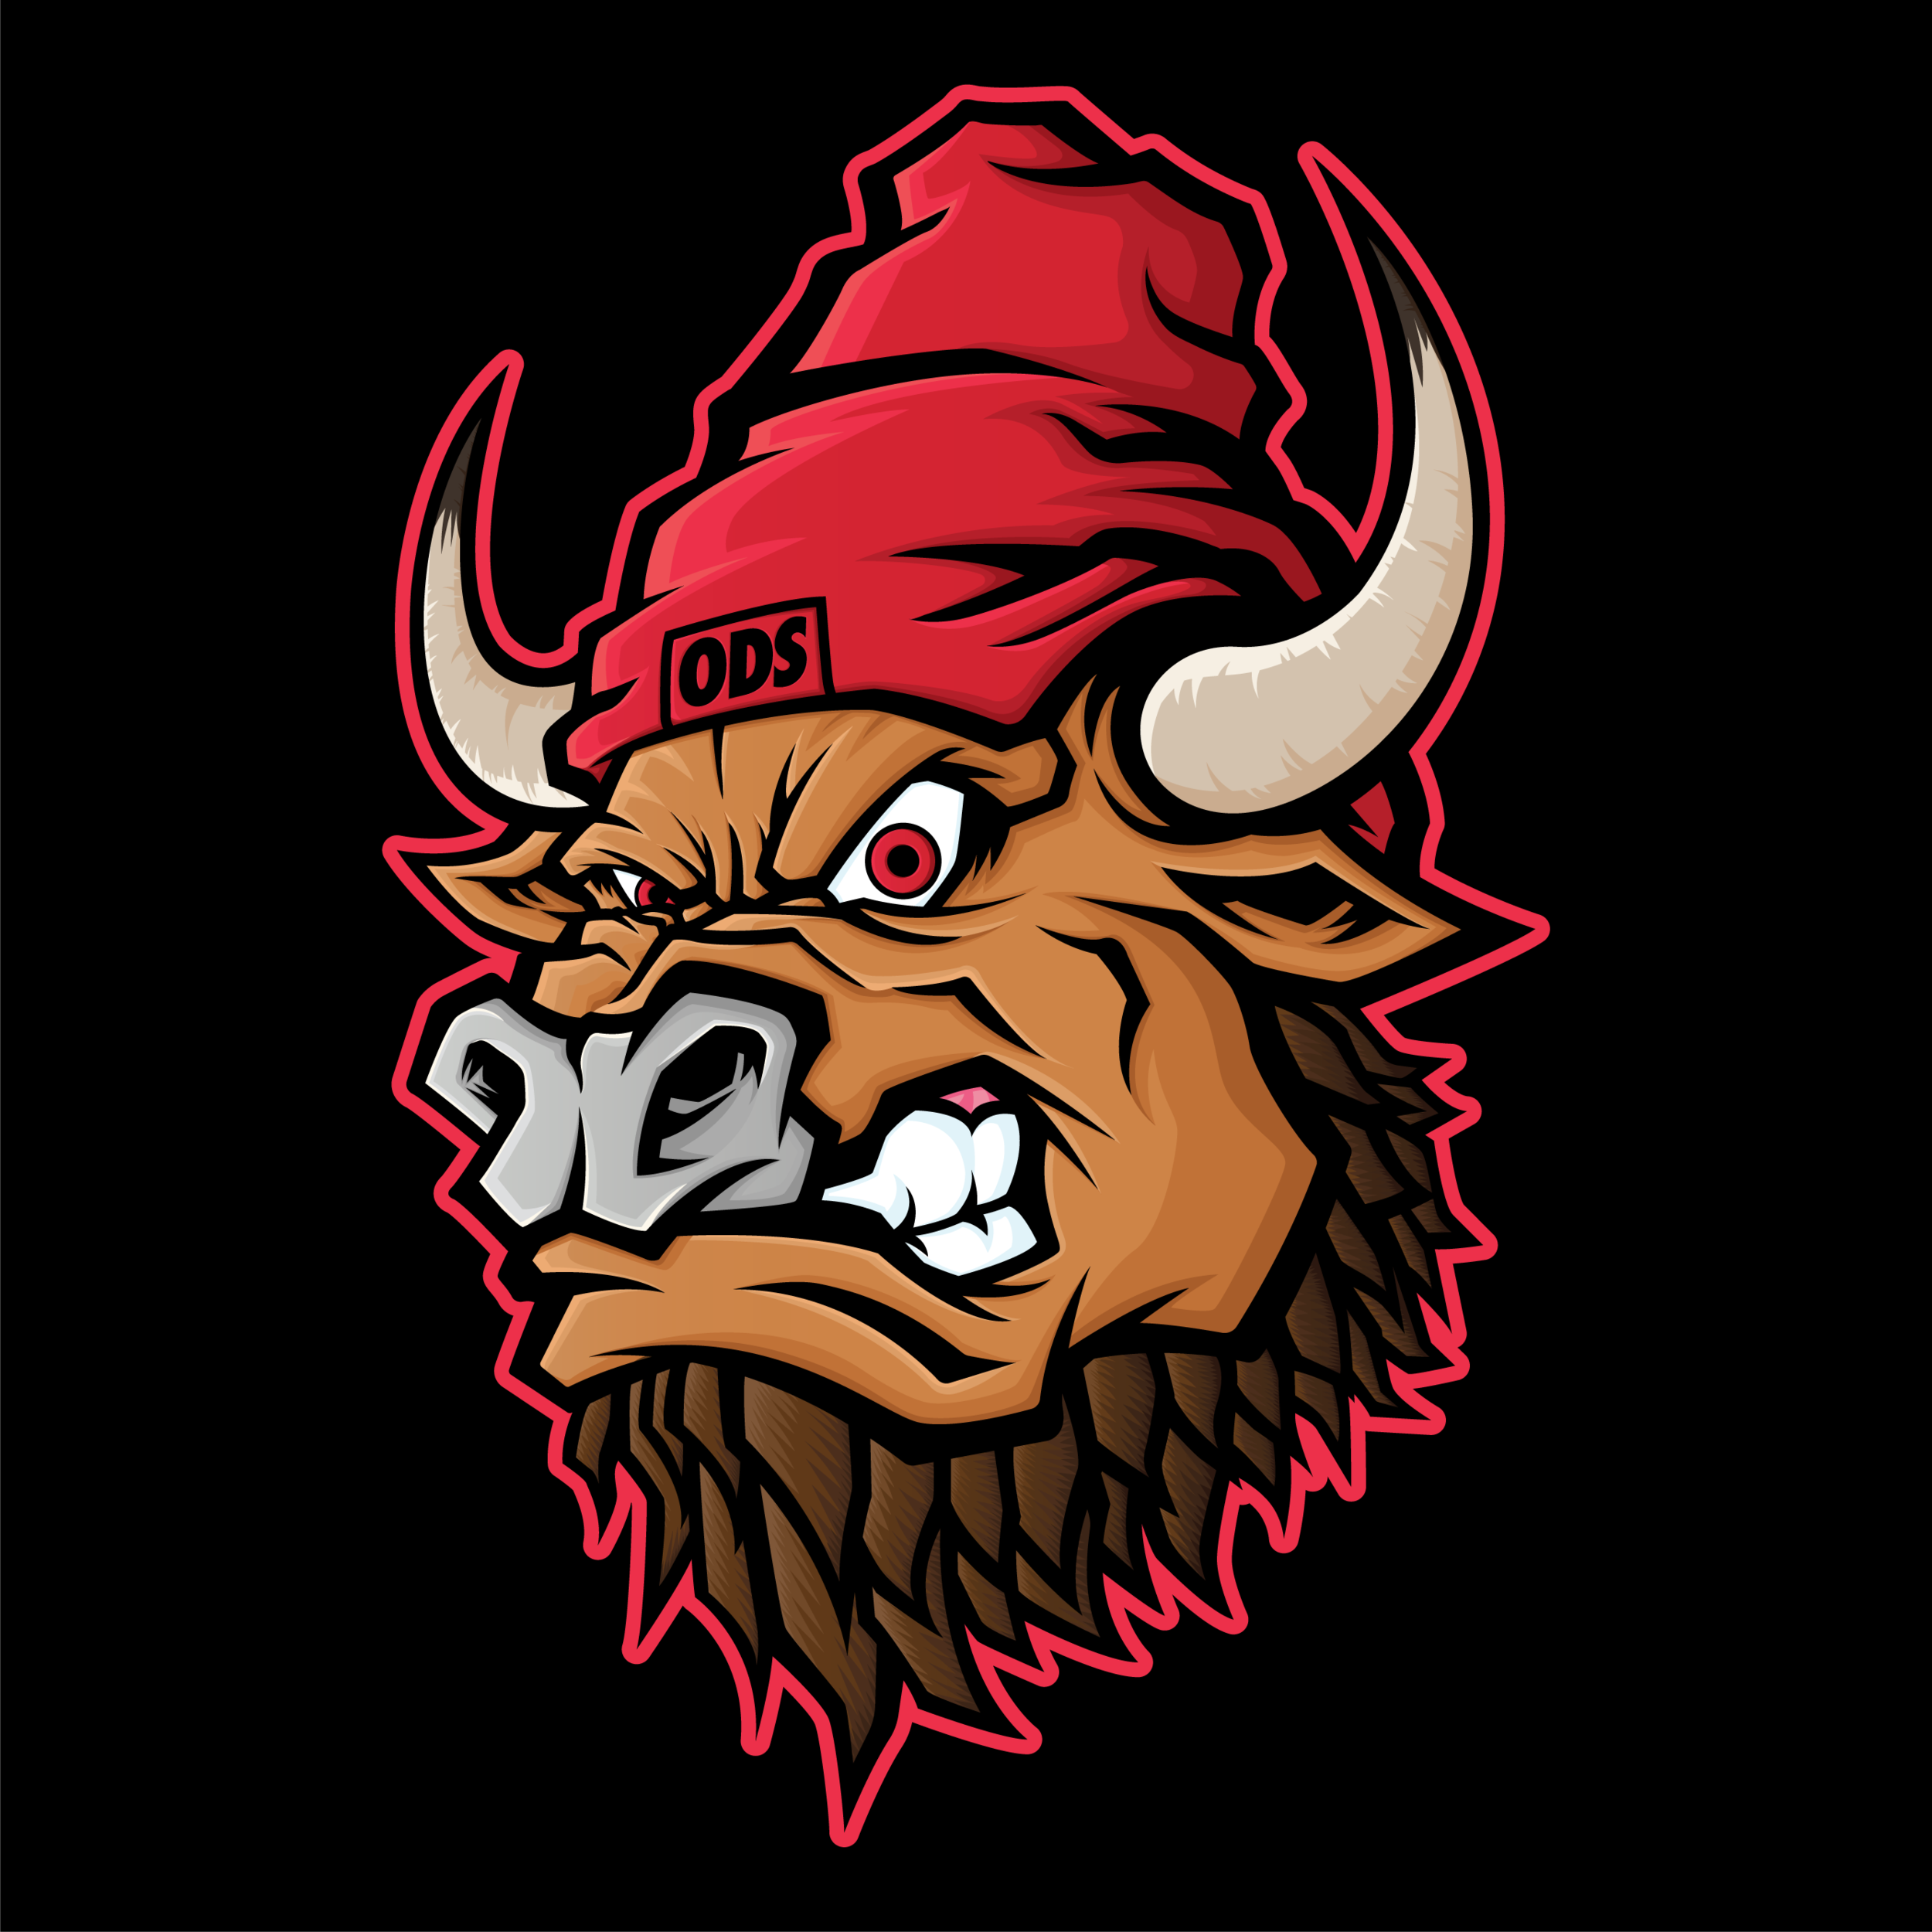 orozodesign-ox-bearded-beast-red-vector-illustration-roberto-orozco-artist-.jpg